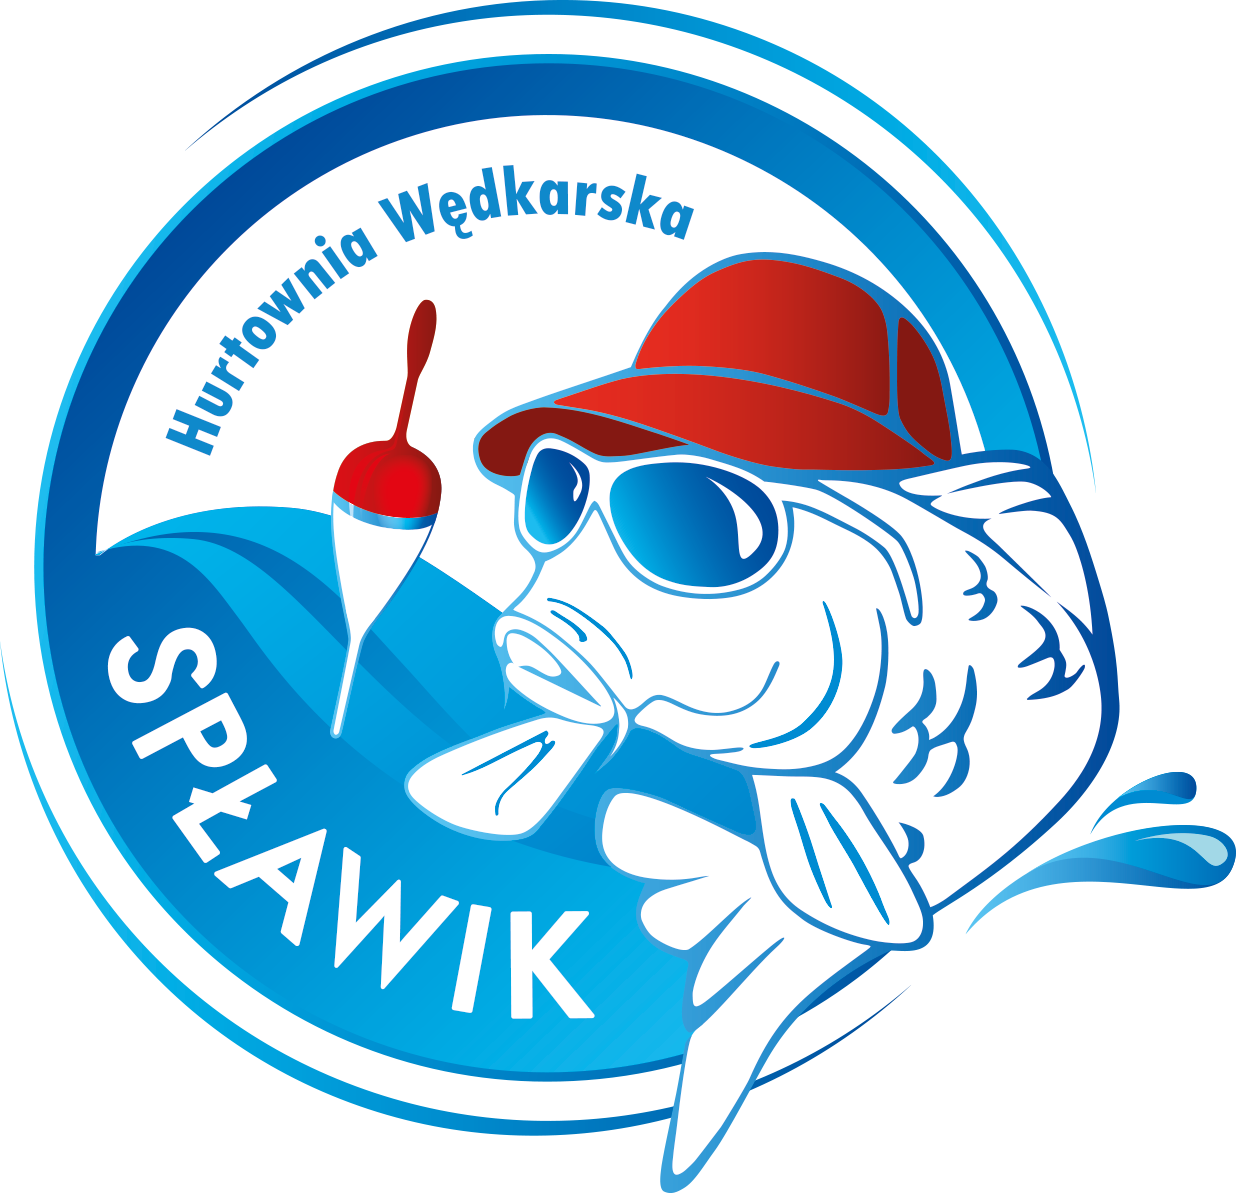 logo-splawik-gradient_hurtownia-wedkarska